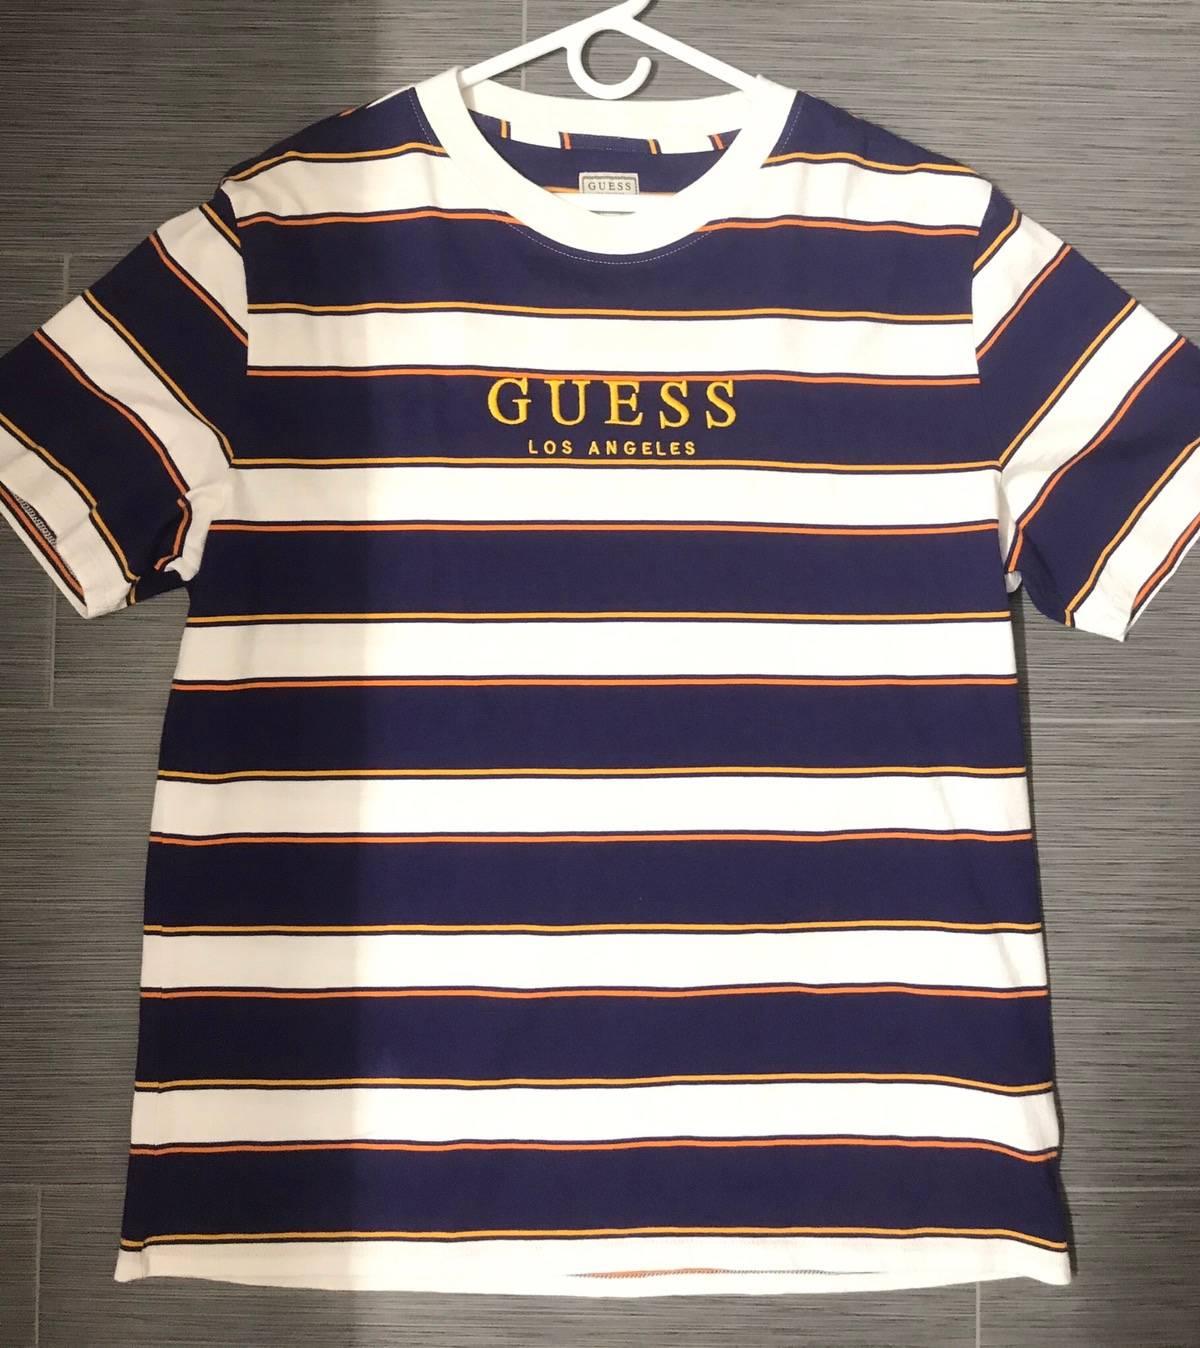 Guess Vintage Guess Striped Shirt Size L $40